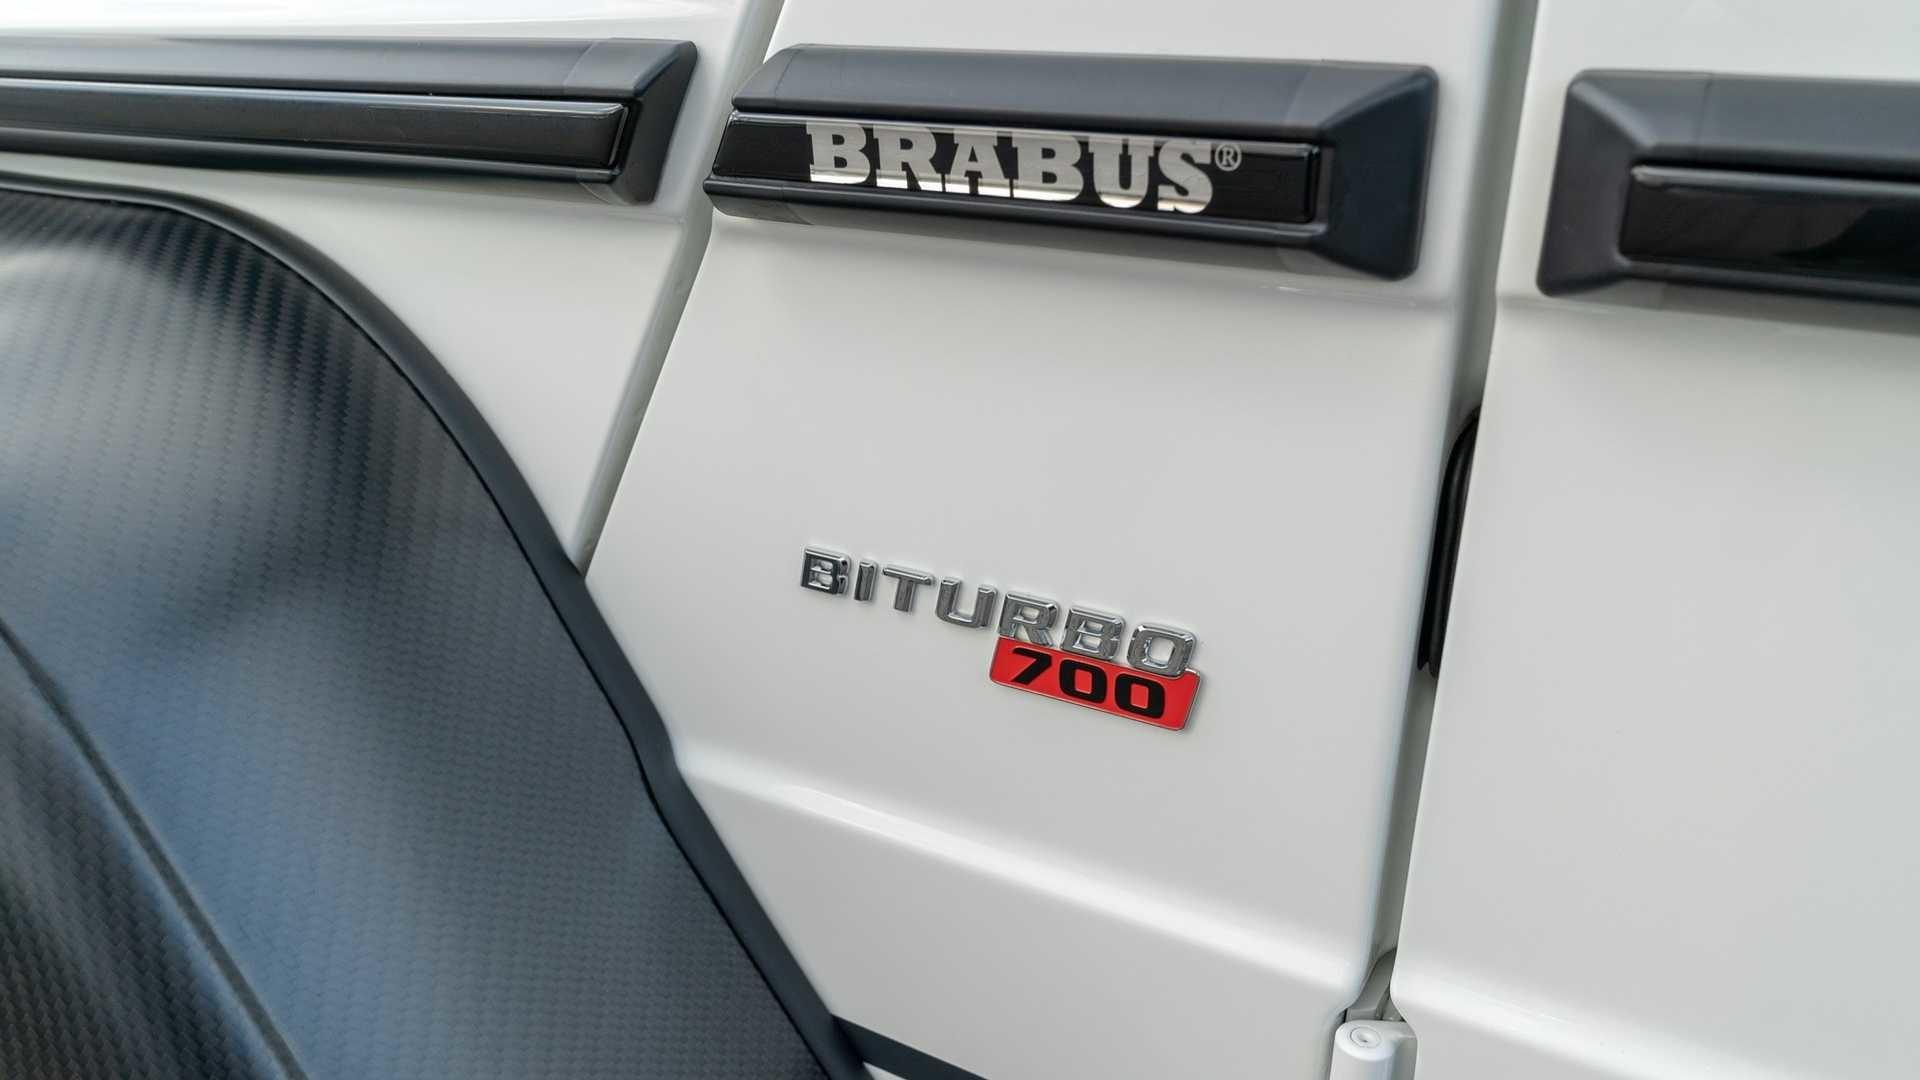 Foto de Brabus 700 4x4 Final Edition (10/14)